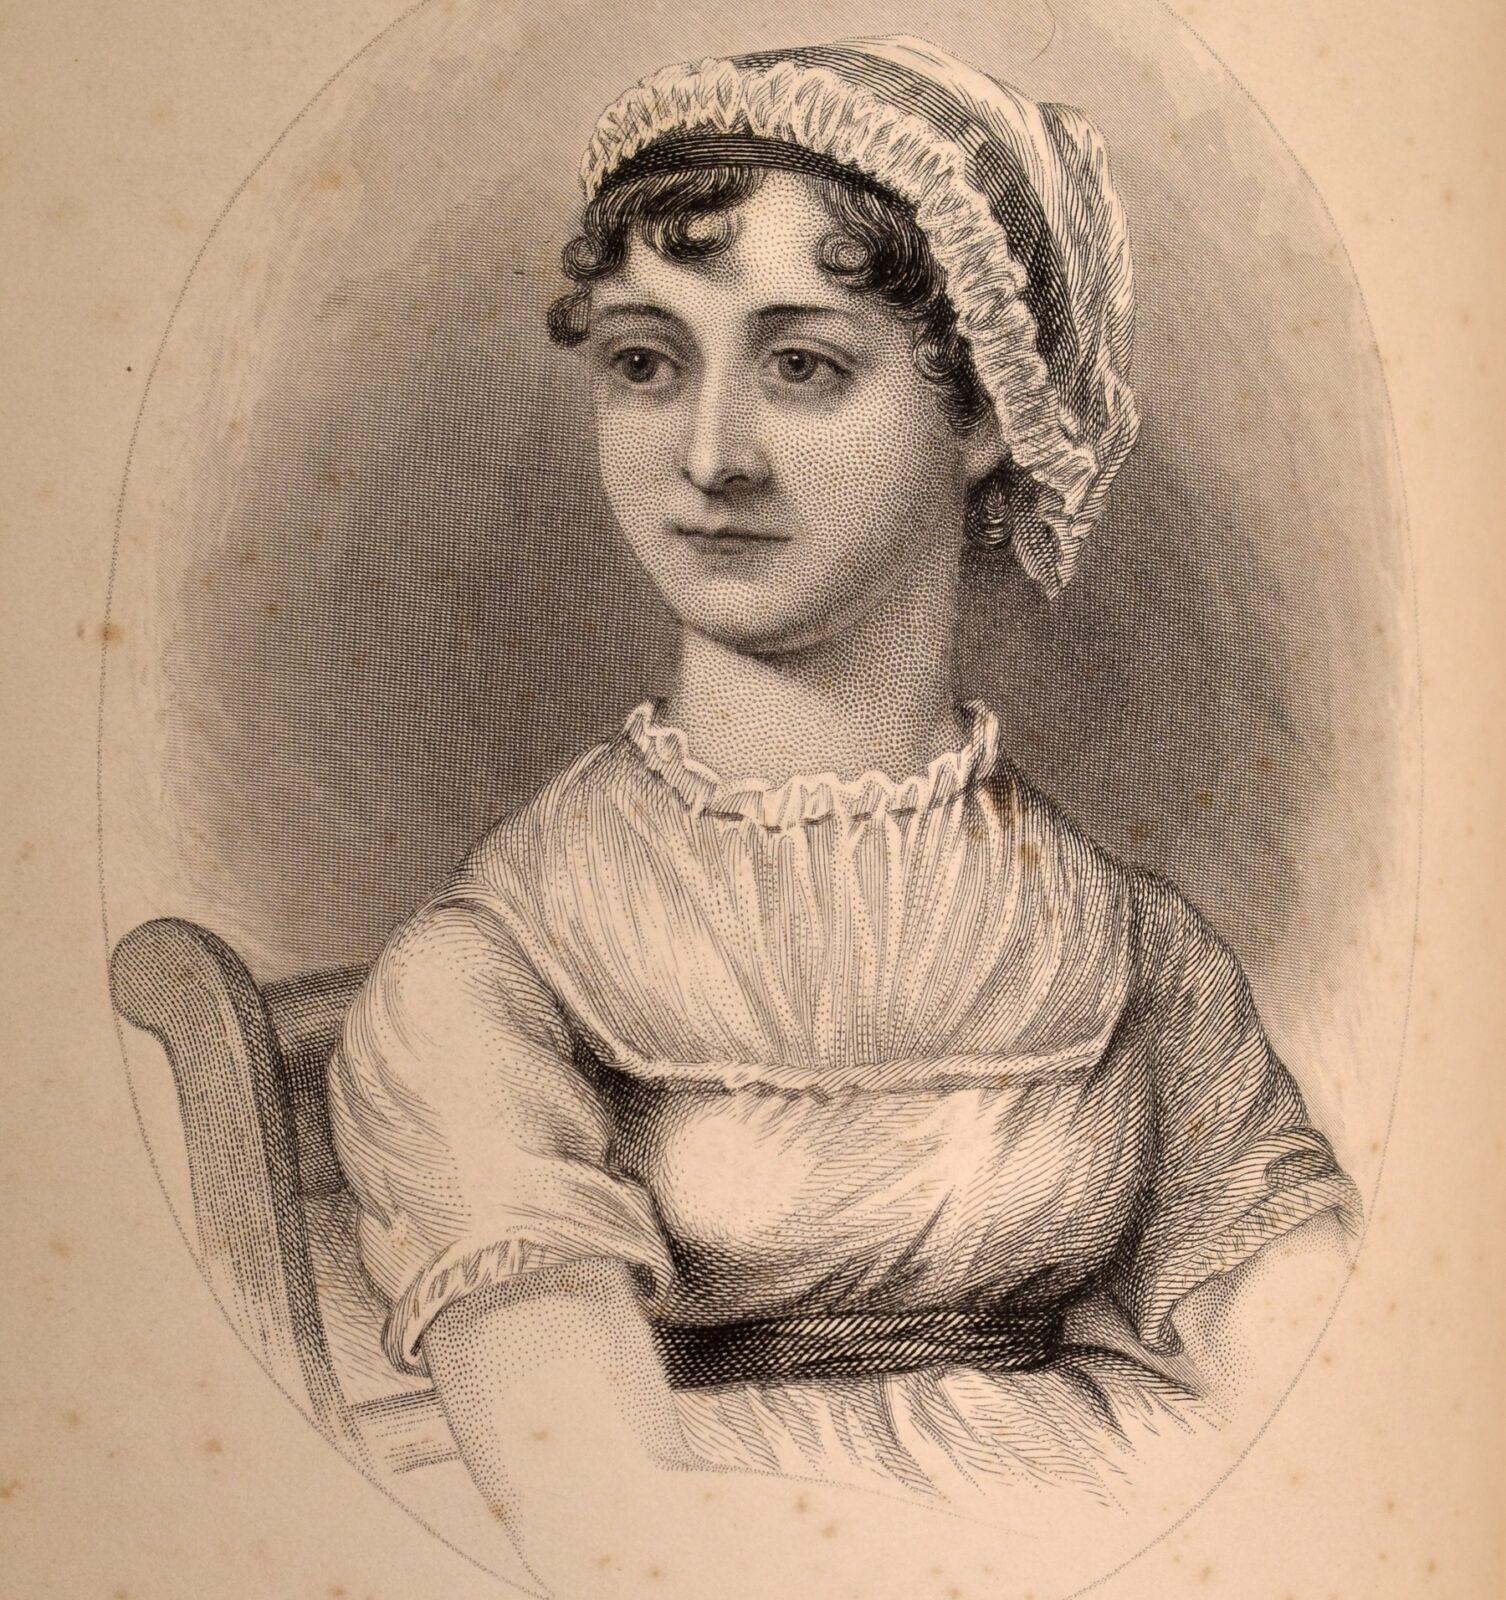 Engraving of Jane Austen, from 'A Memoir of Jane Austen' (1871)